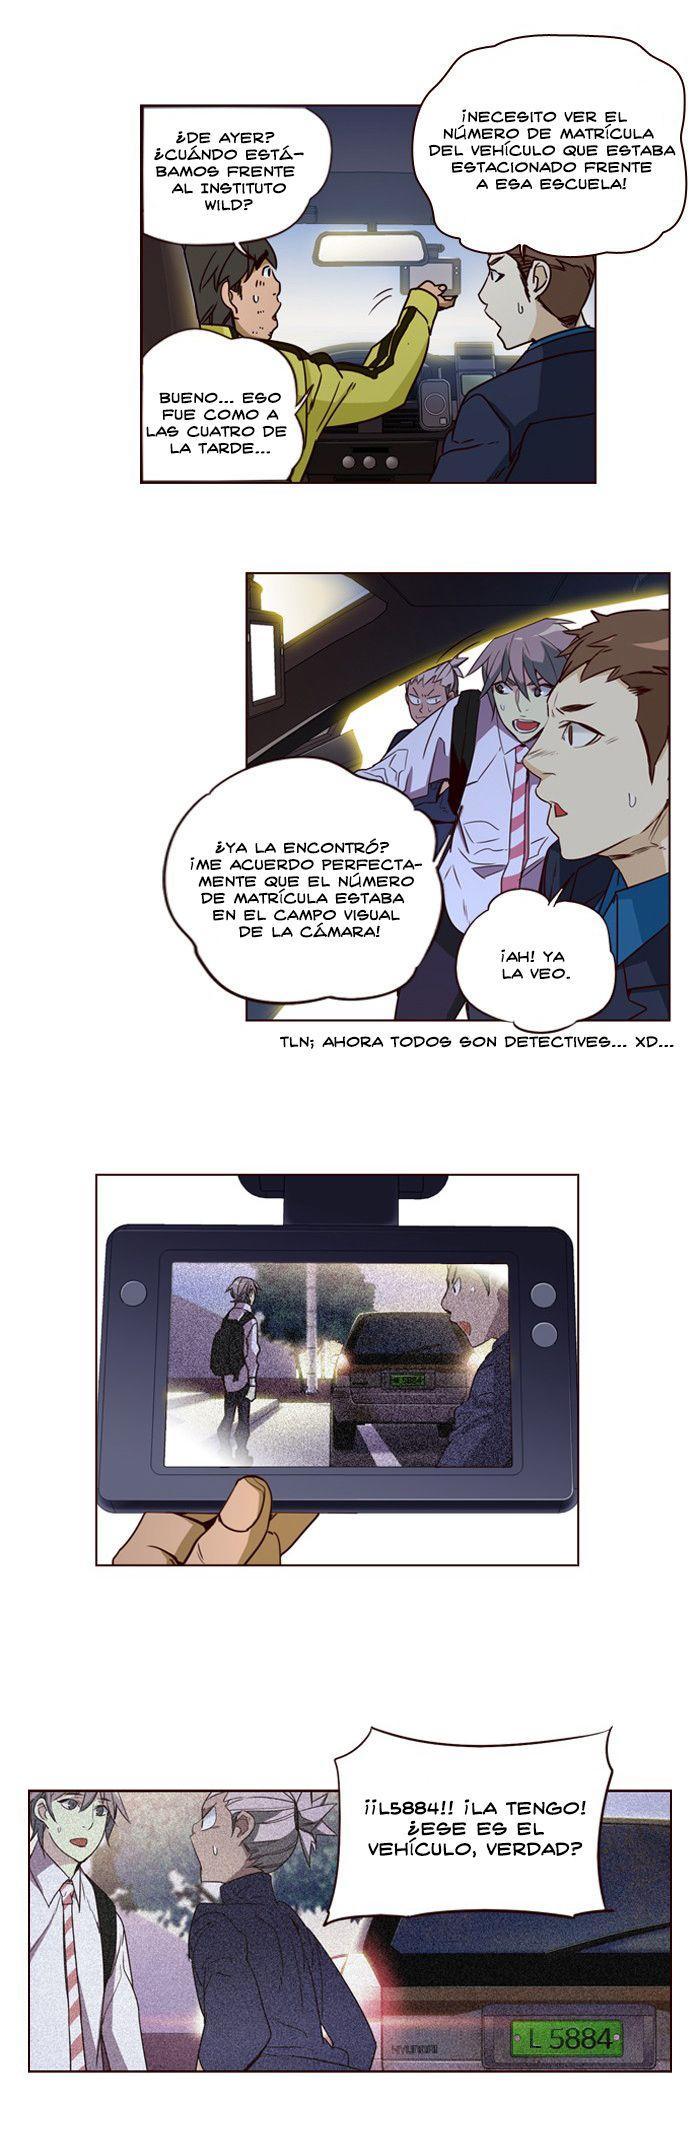 http://c5.ninemanga.com/es_manga/32/416/462763/58f5fdc24696f56a135893cb6a0ebade.jpg Page 6